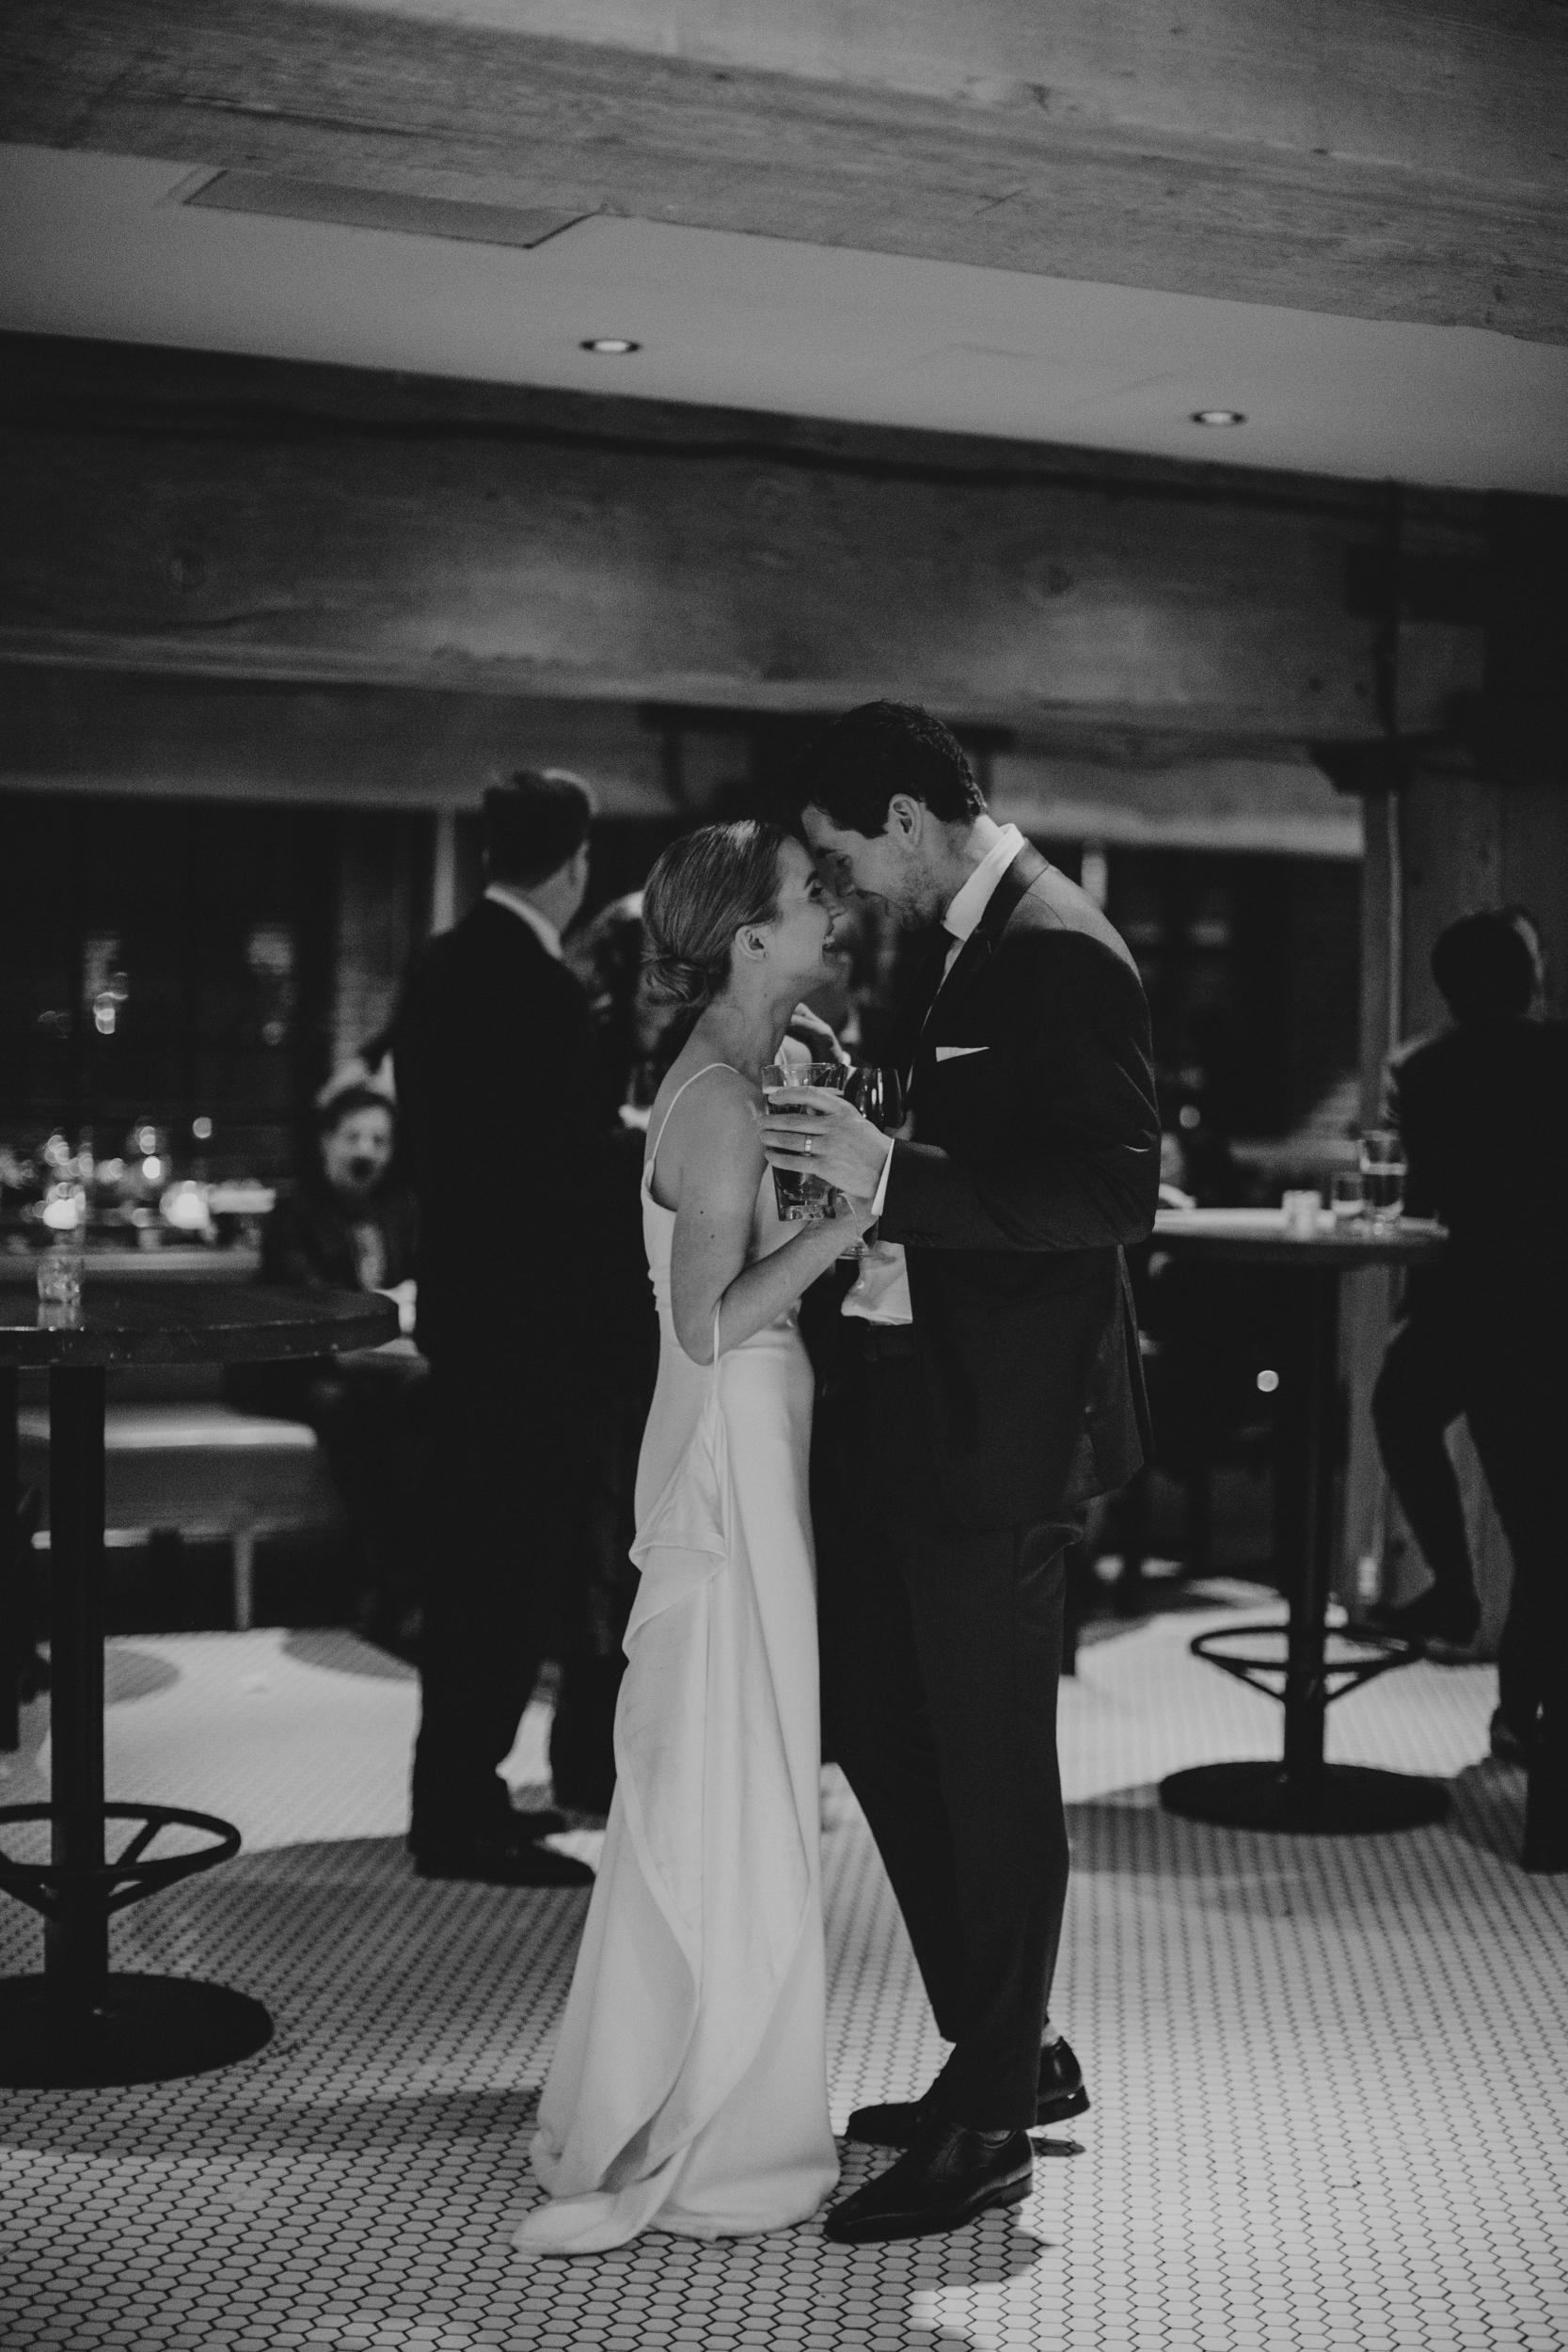 Earls-Loft-City-Vancouver-Wedding-20.jpg